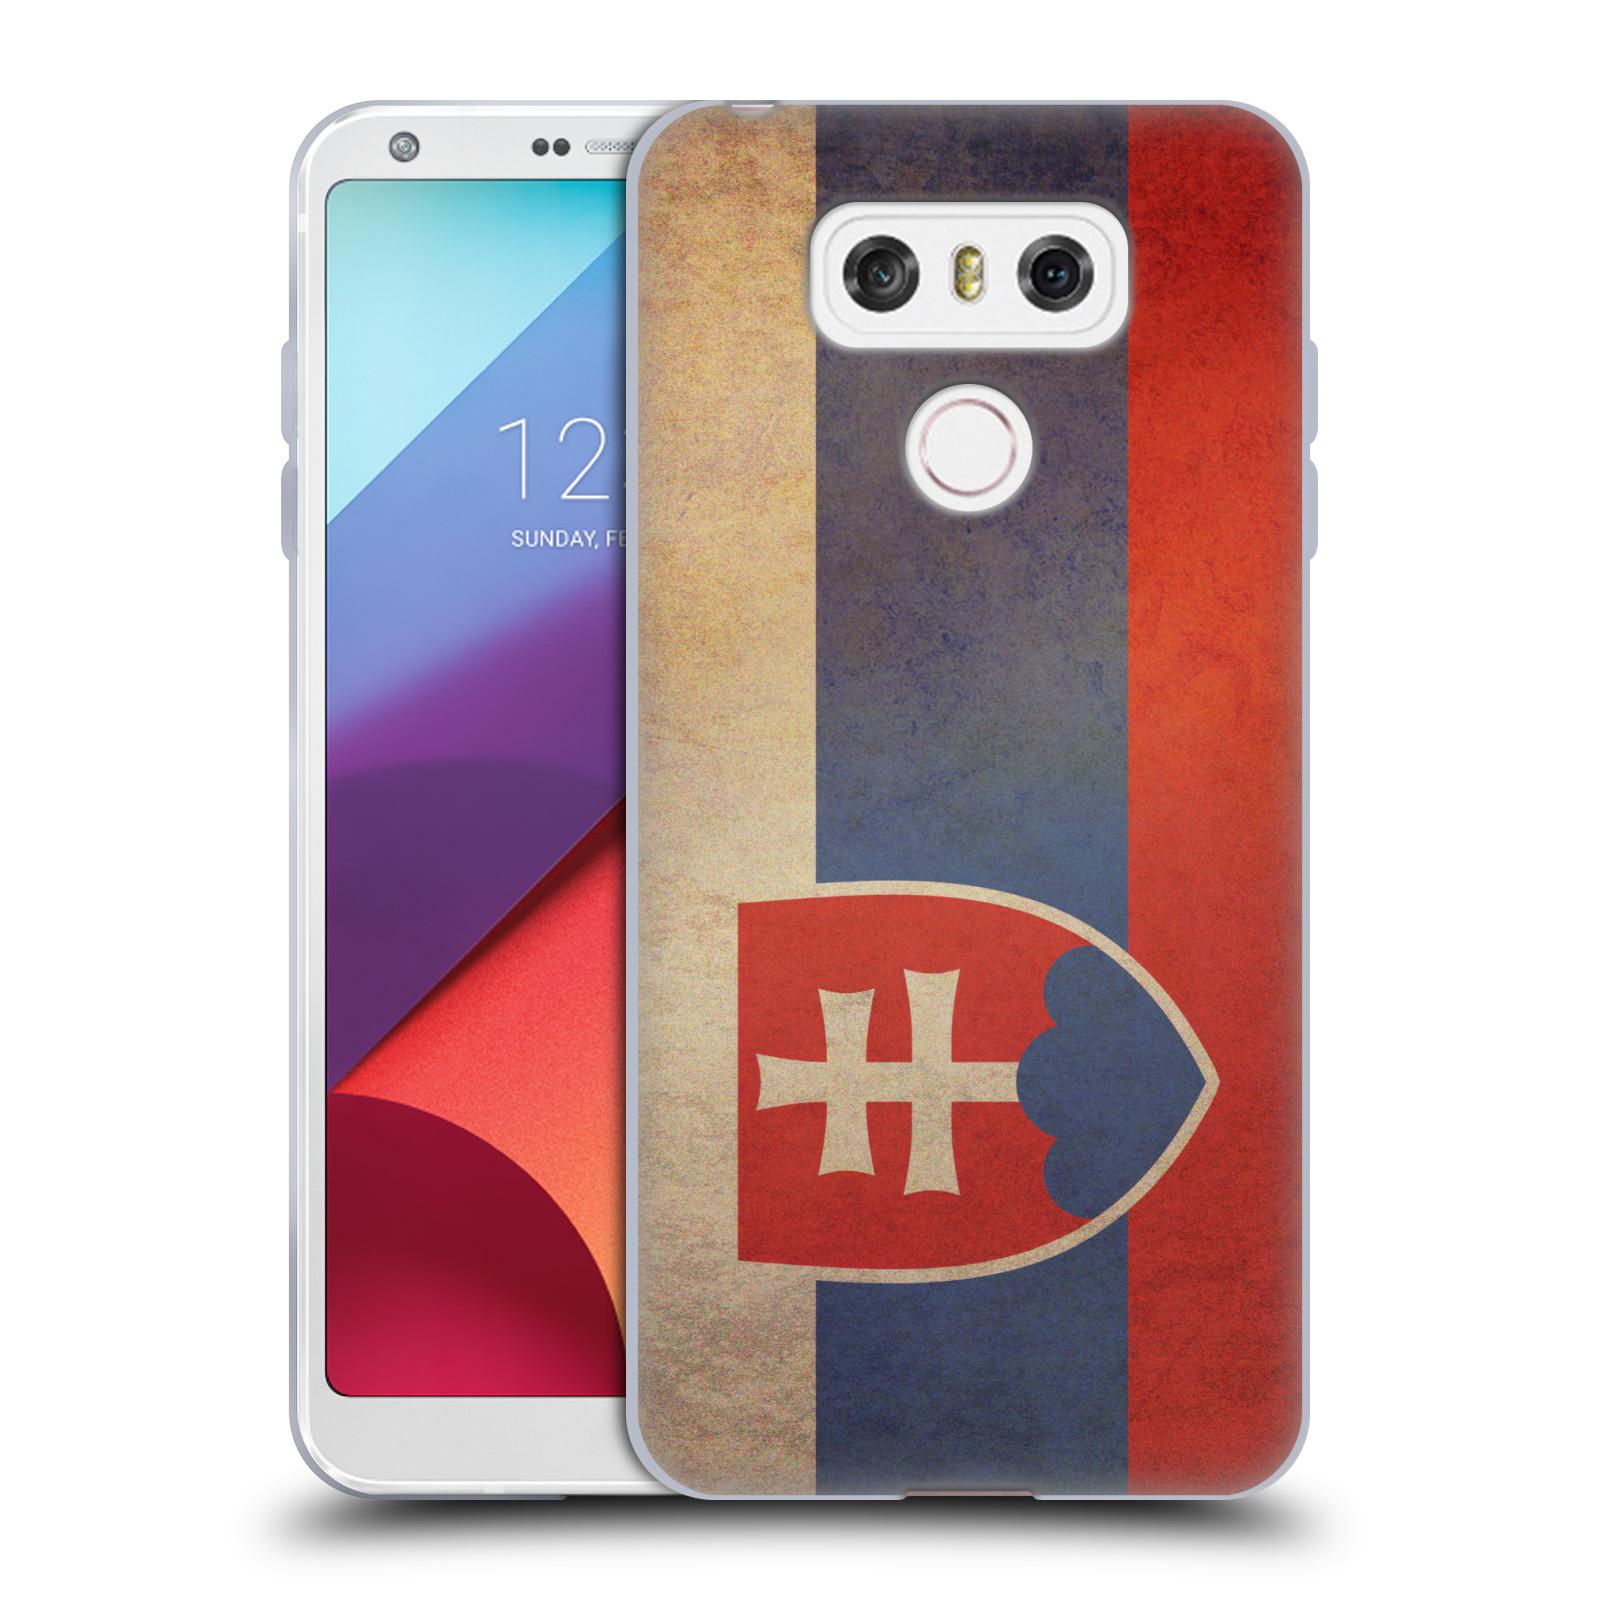 Silikonové pouzdro na mobil LG G6 - Head Case VLAJKA SLOVENSKO (Silikonový kryt či obal na mobilní telefon LG G6 H870 / LG G6 Dual SIM H870DS)